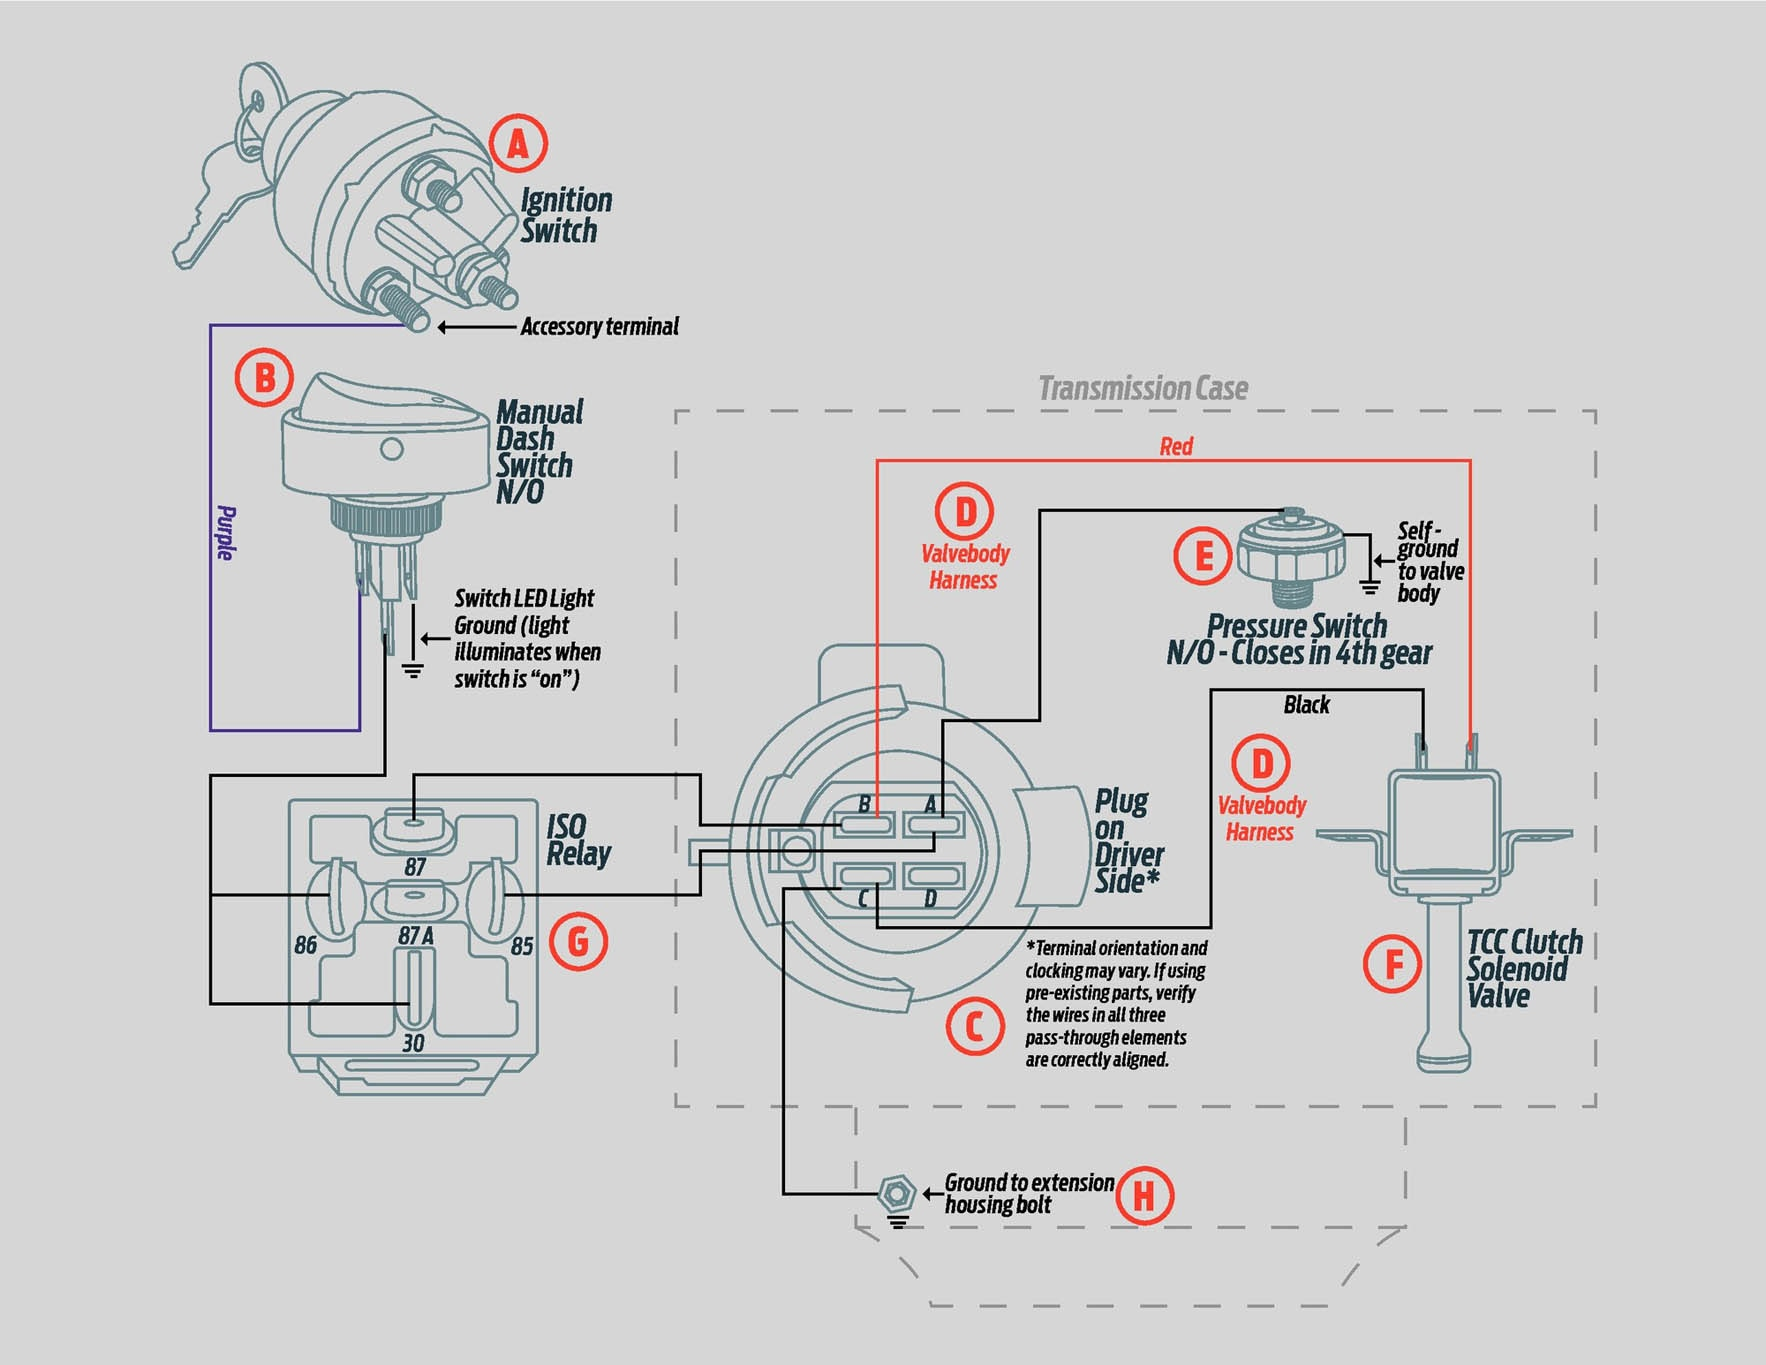 E4od Transmission Wiring Diagram Grounds. E4od Wiring Harness, E4od on nv4500 wiring diagram, ego wiring diagram, abs wiring diagram, aod wiring diagram, 4x4 wiring diagram, allison 2000 series wiring diagram, 4r70w wiring diagram, ecm wiring diagram, 4r55e wiring diagram, pcm wiring diagram, f350 wiring diagram, 4l60e wiring diagram, 47re wiring diagram, 4l80e wiring diagram, 5r110 wiring diagram, fnr5 wiring diagram, egr wiring diagram, 5r55e wiring diagram, ford wiring diagram, a604 wiring diagram,